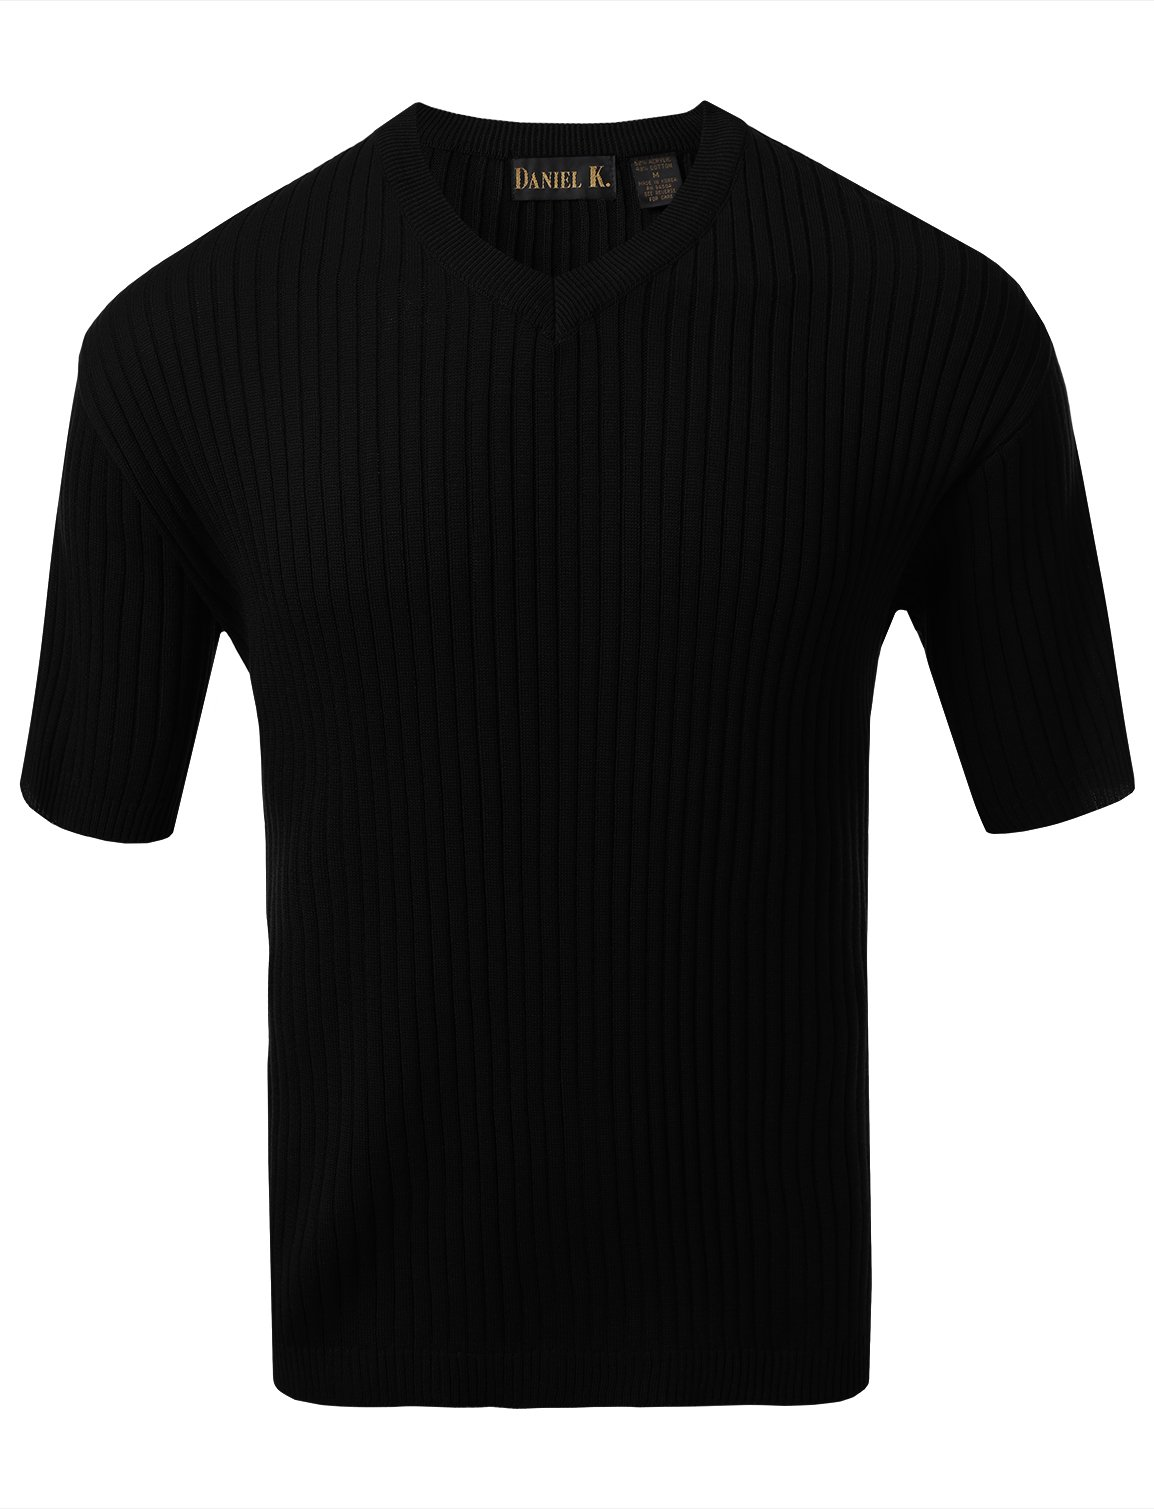 7 Encounter Men's V Neck Short Sleeve Large Ribbed Sweater Black M